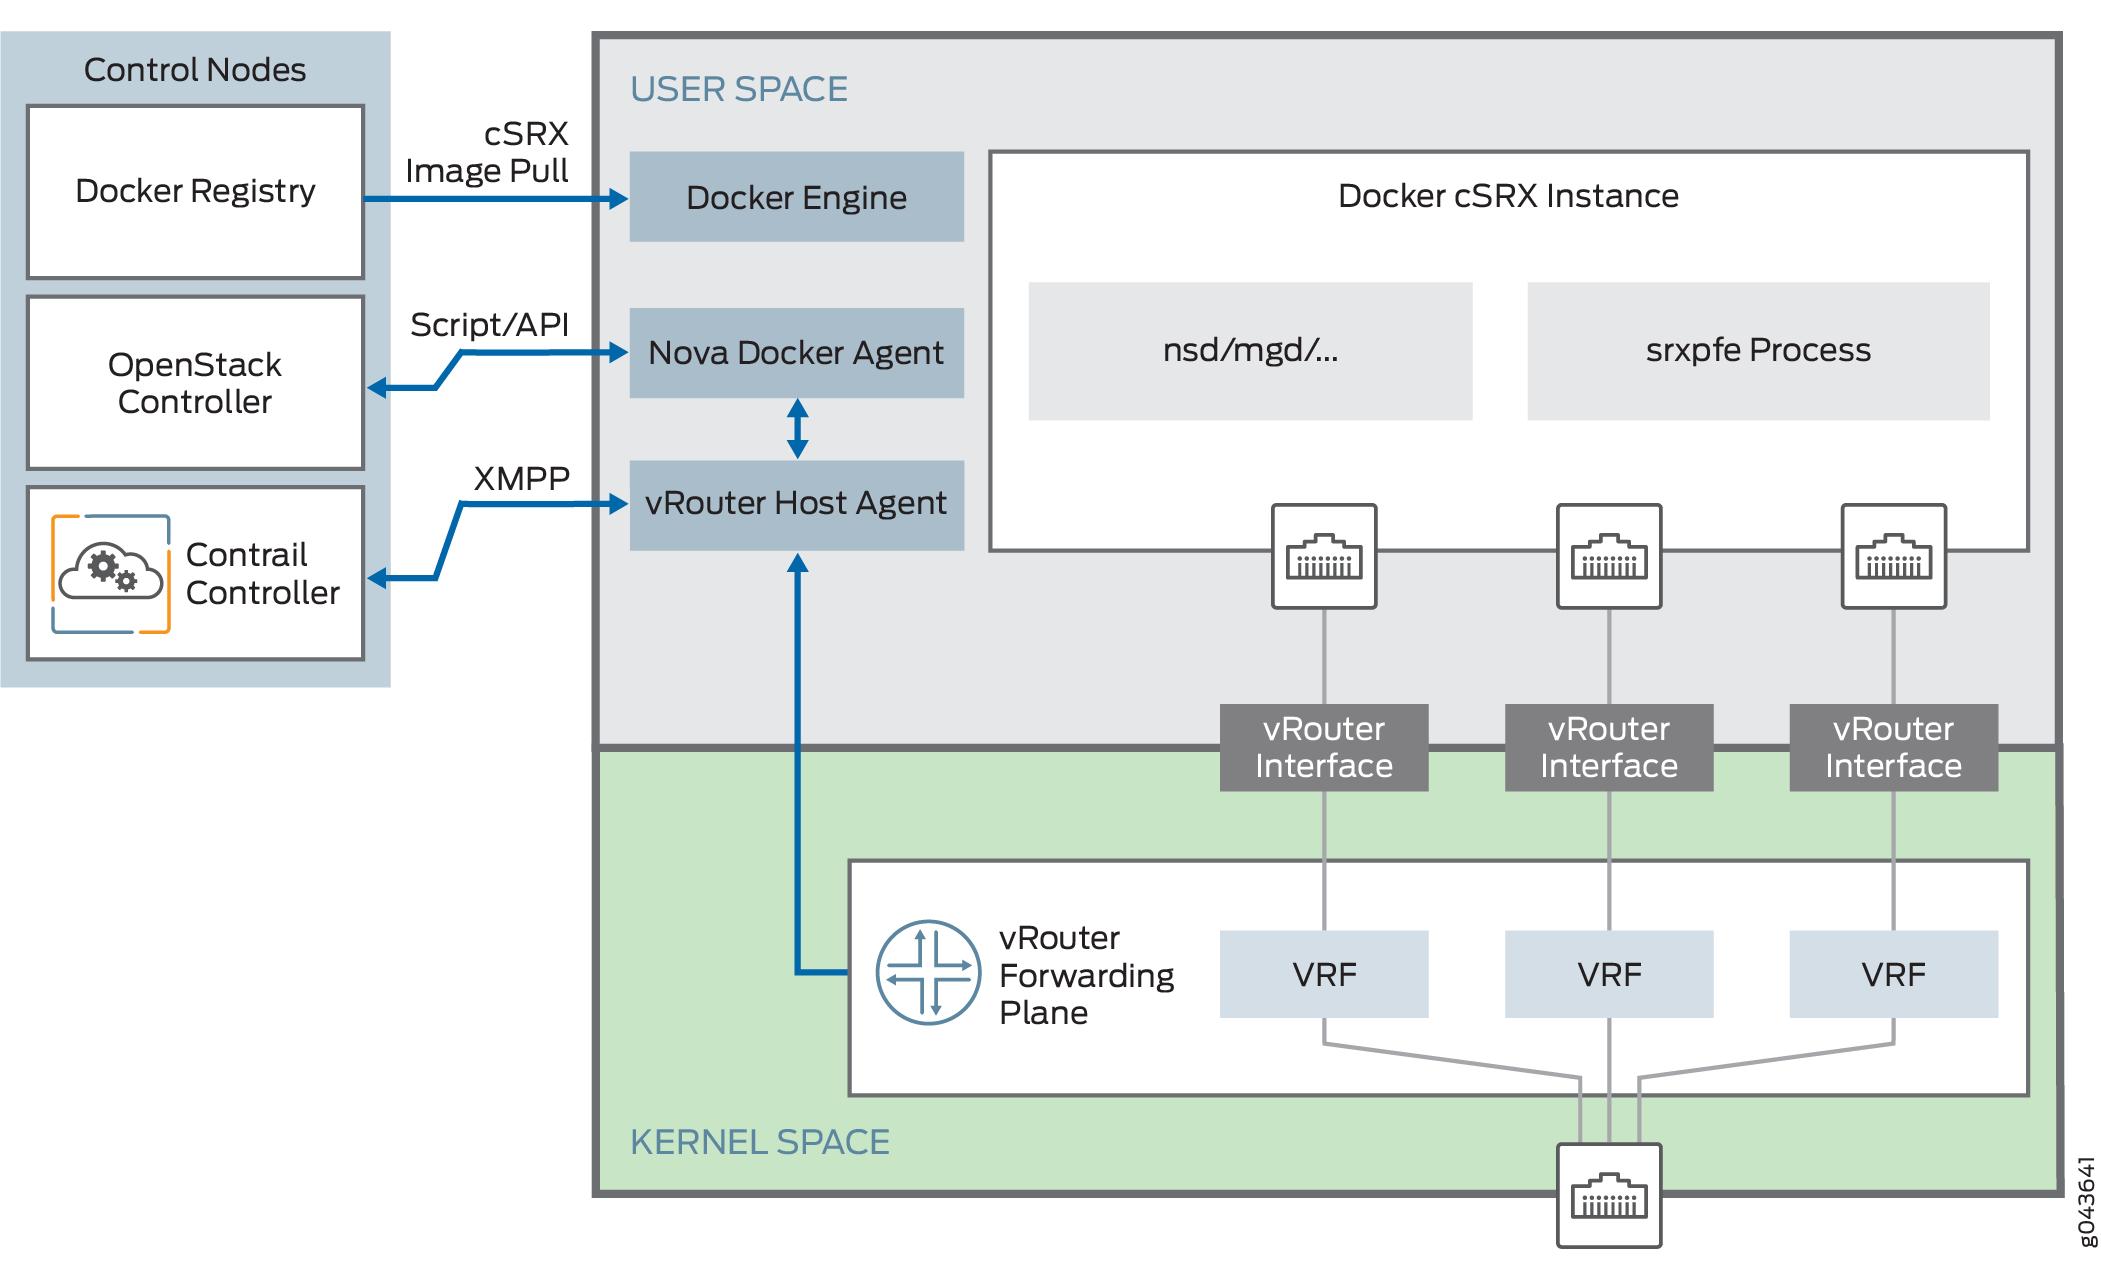 Junos OS Release 18 3R1 for cSRX - TechLibrary - Juniper Networks